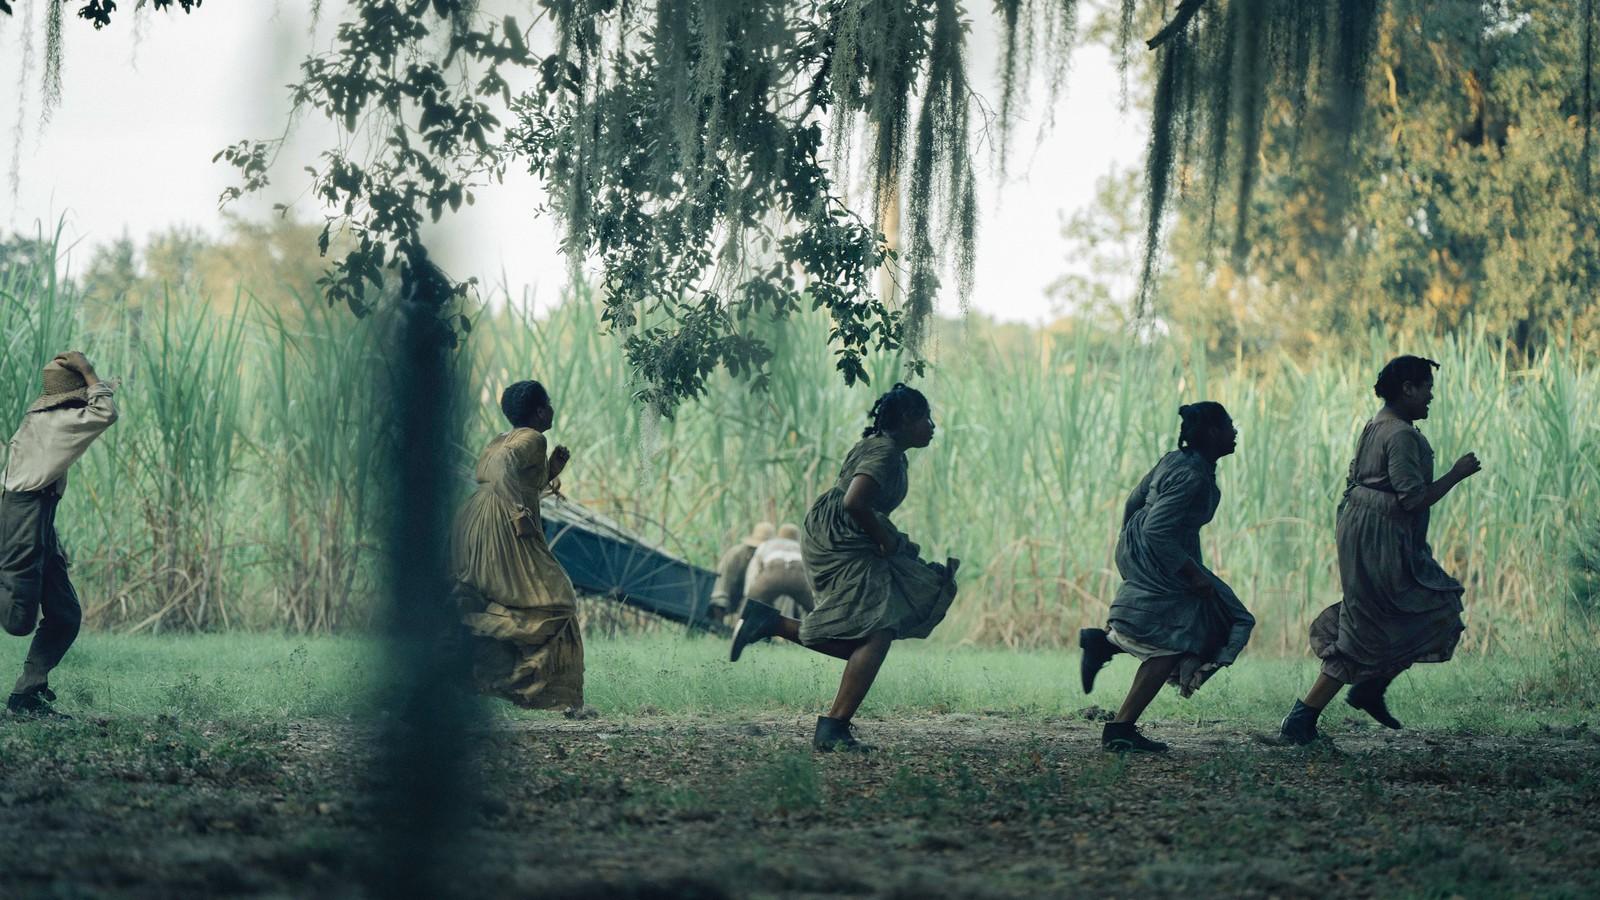 Foto: The Underground Railroad